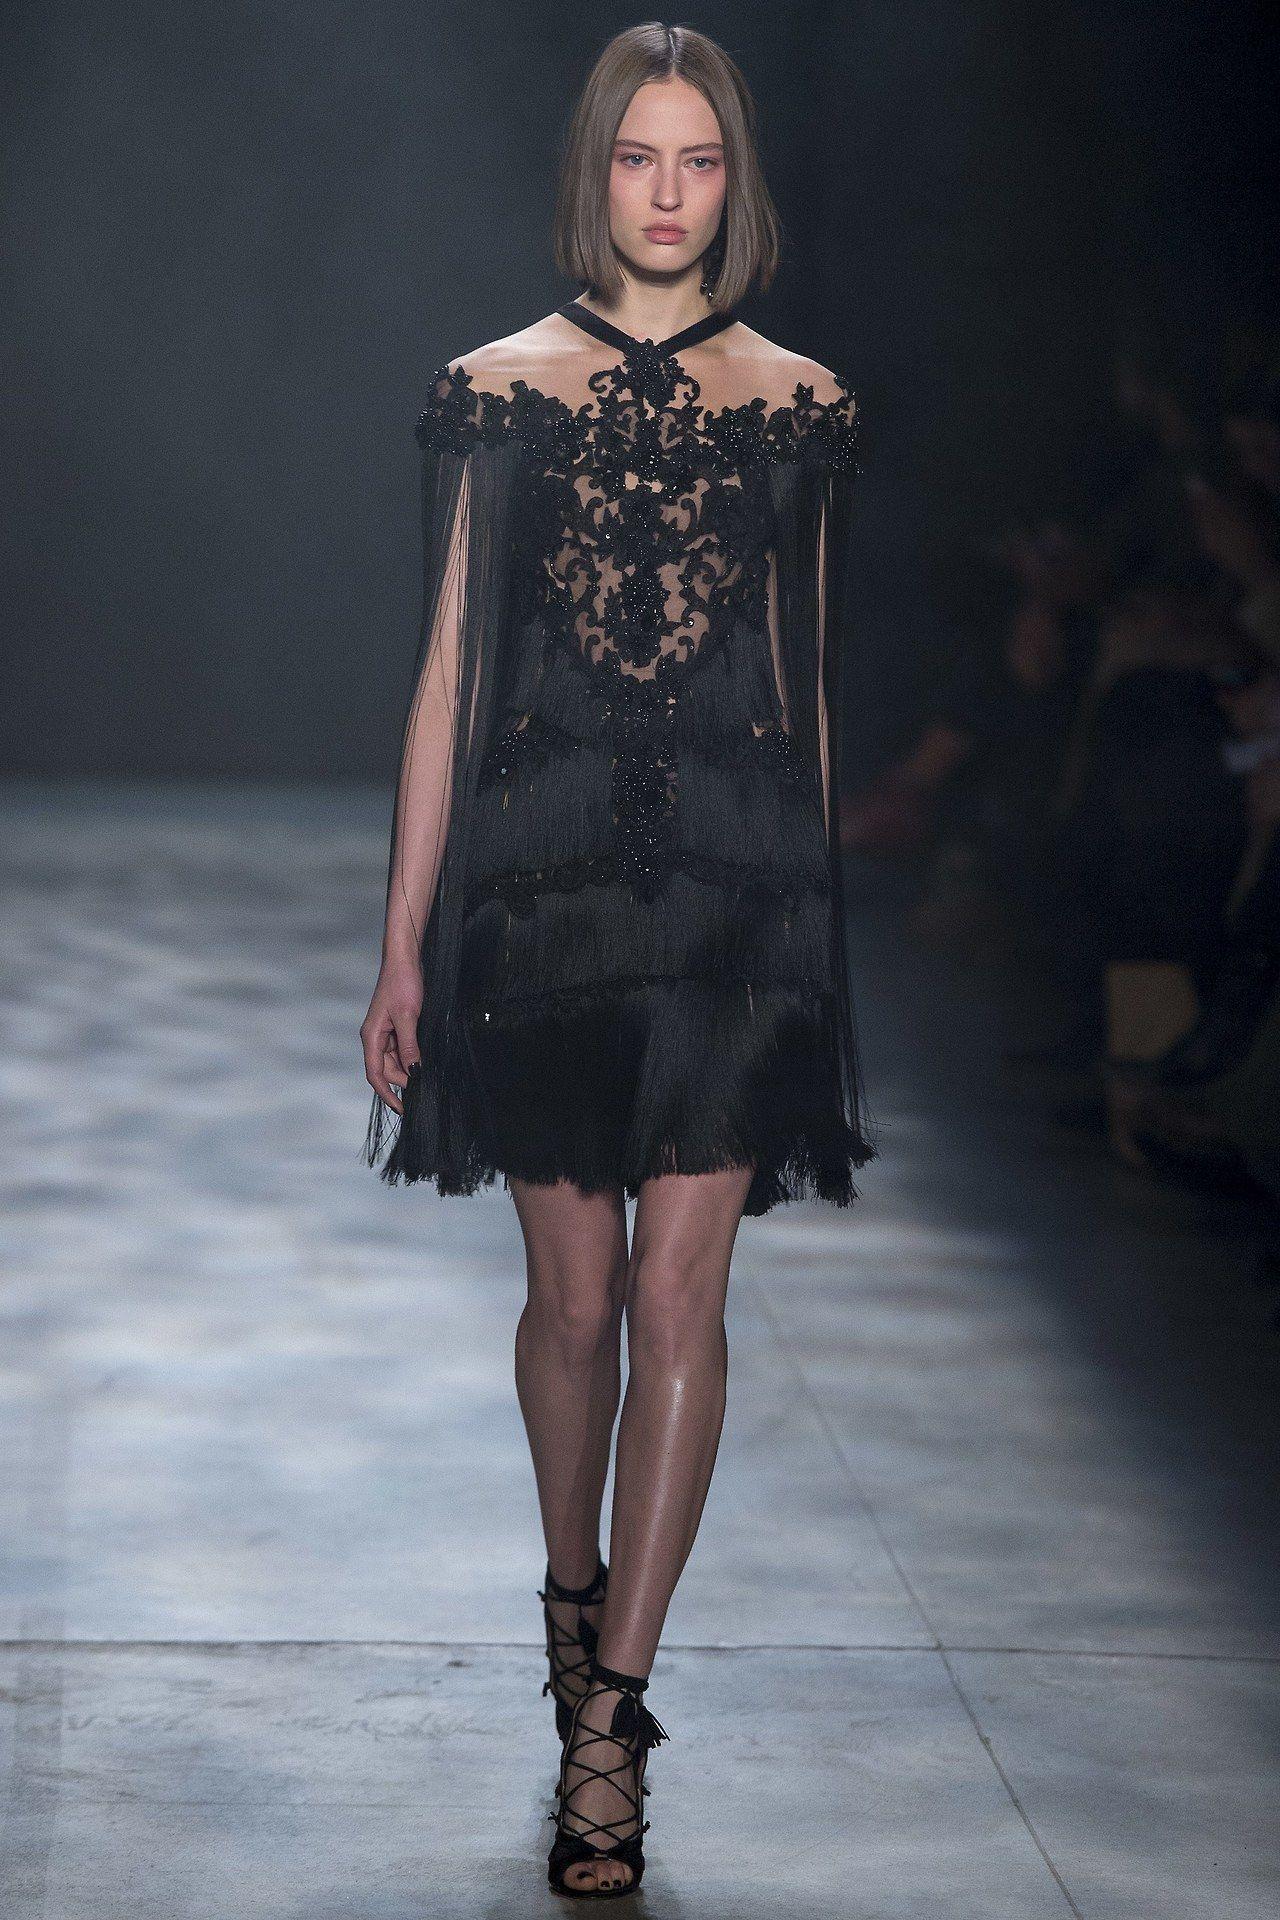 fashionpassion dress short dress model marchesa fashion style trend glam glamour